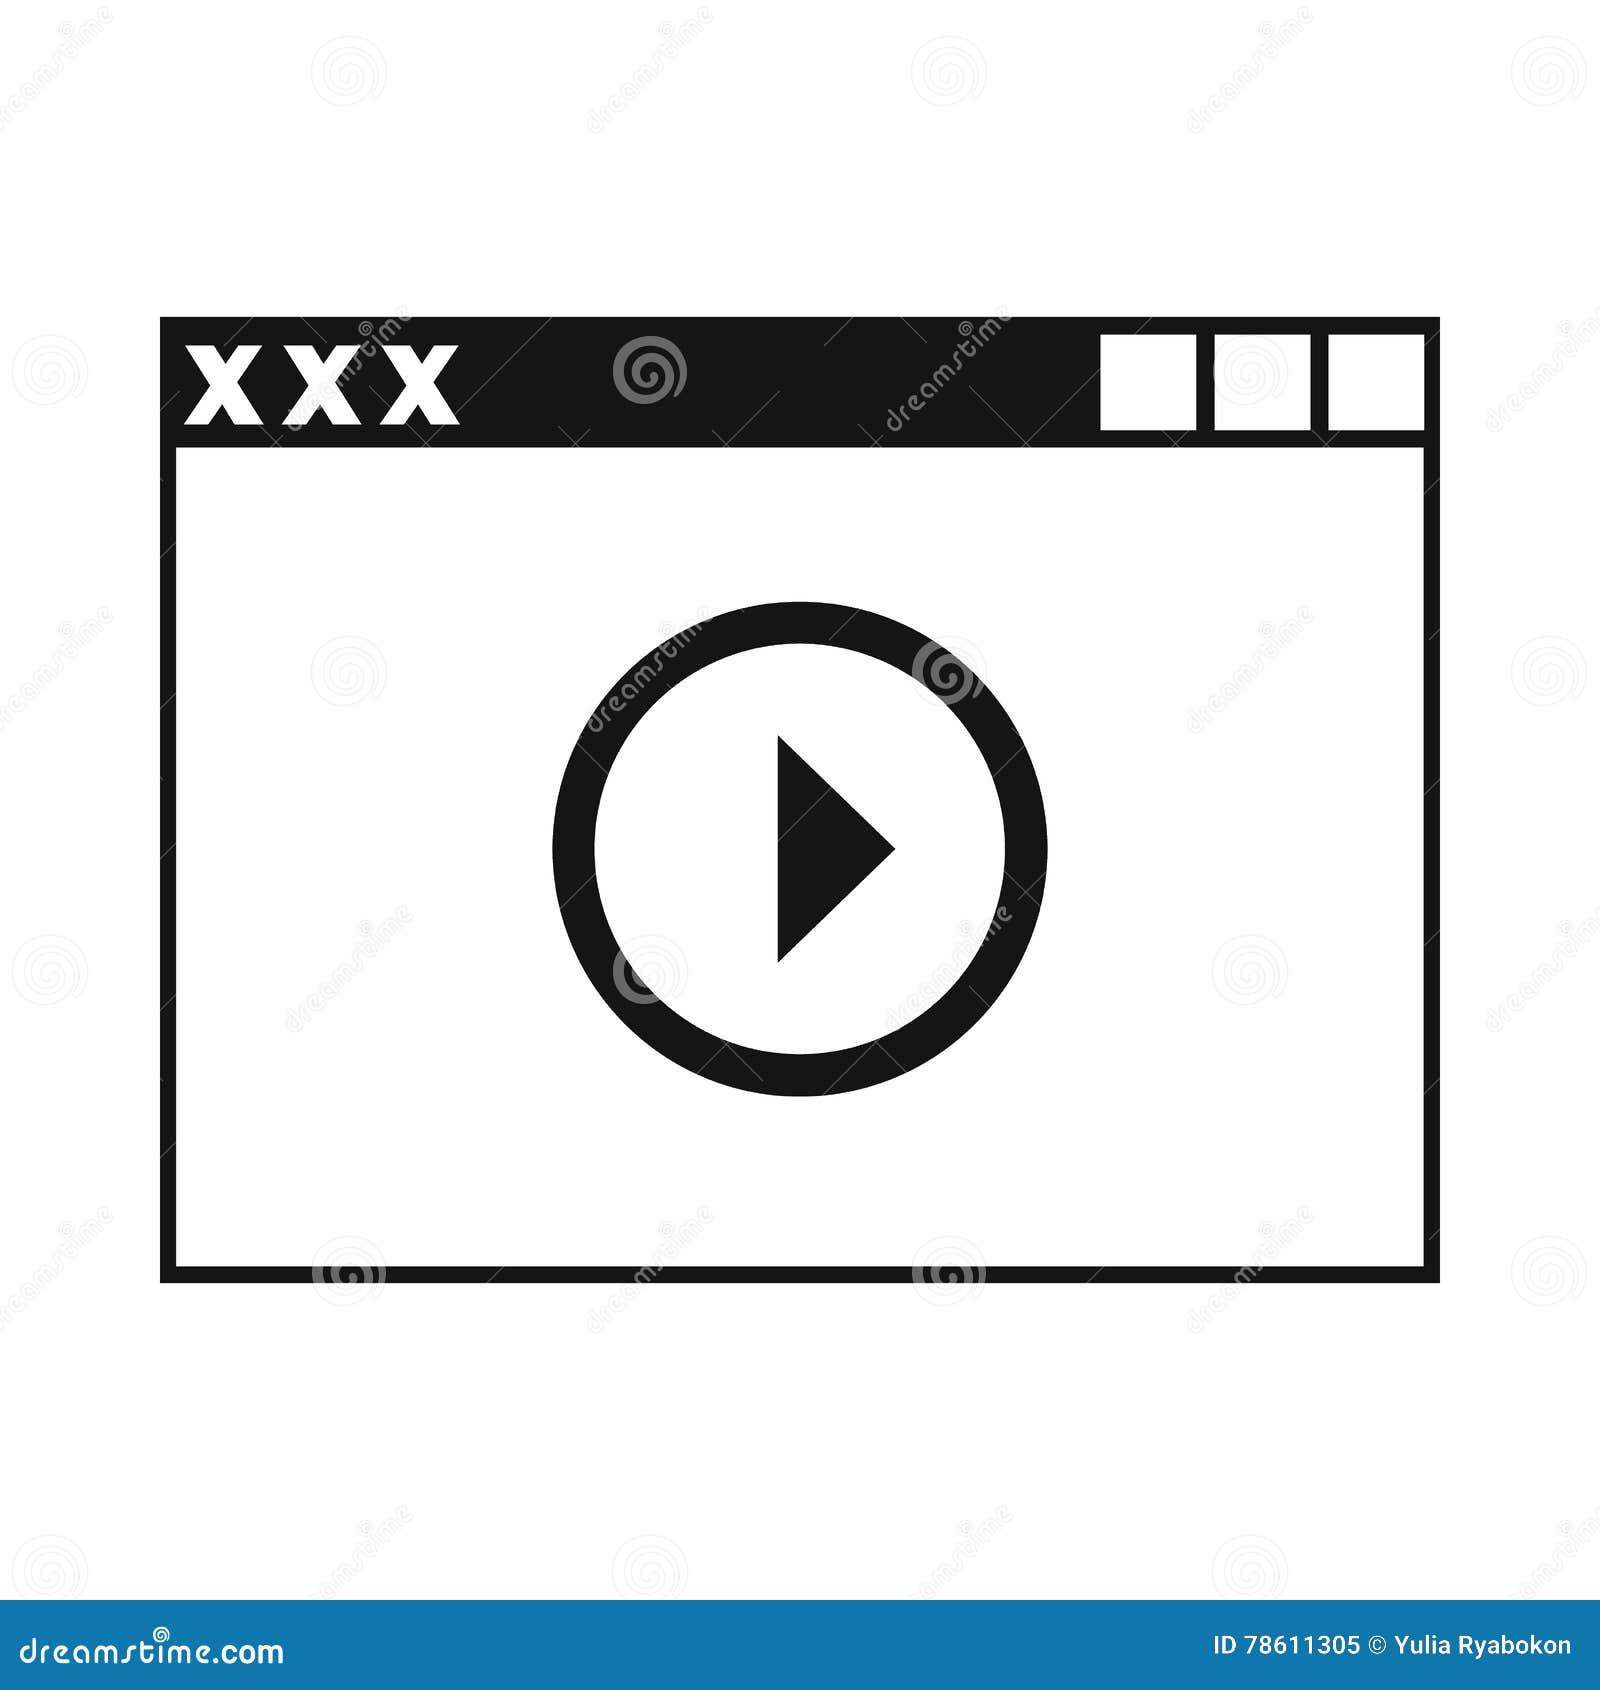 www xxx vidiyo omegle teen porn